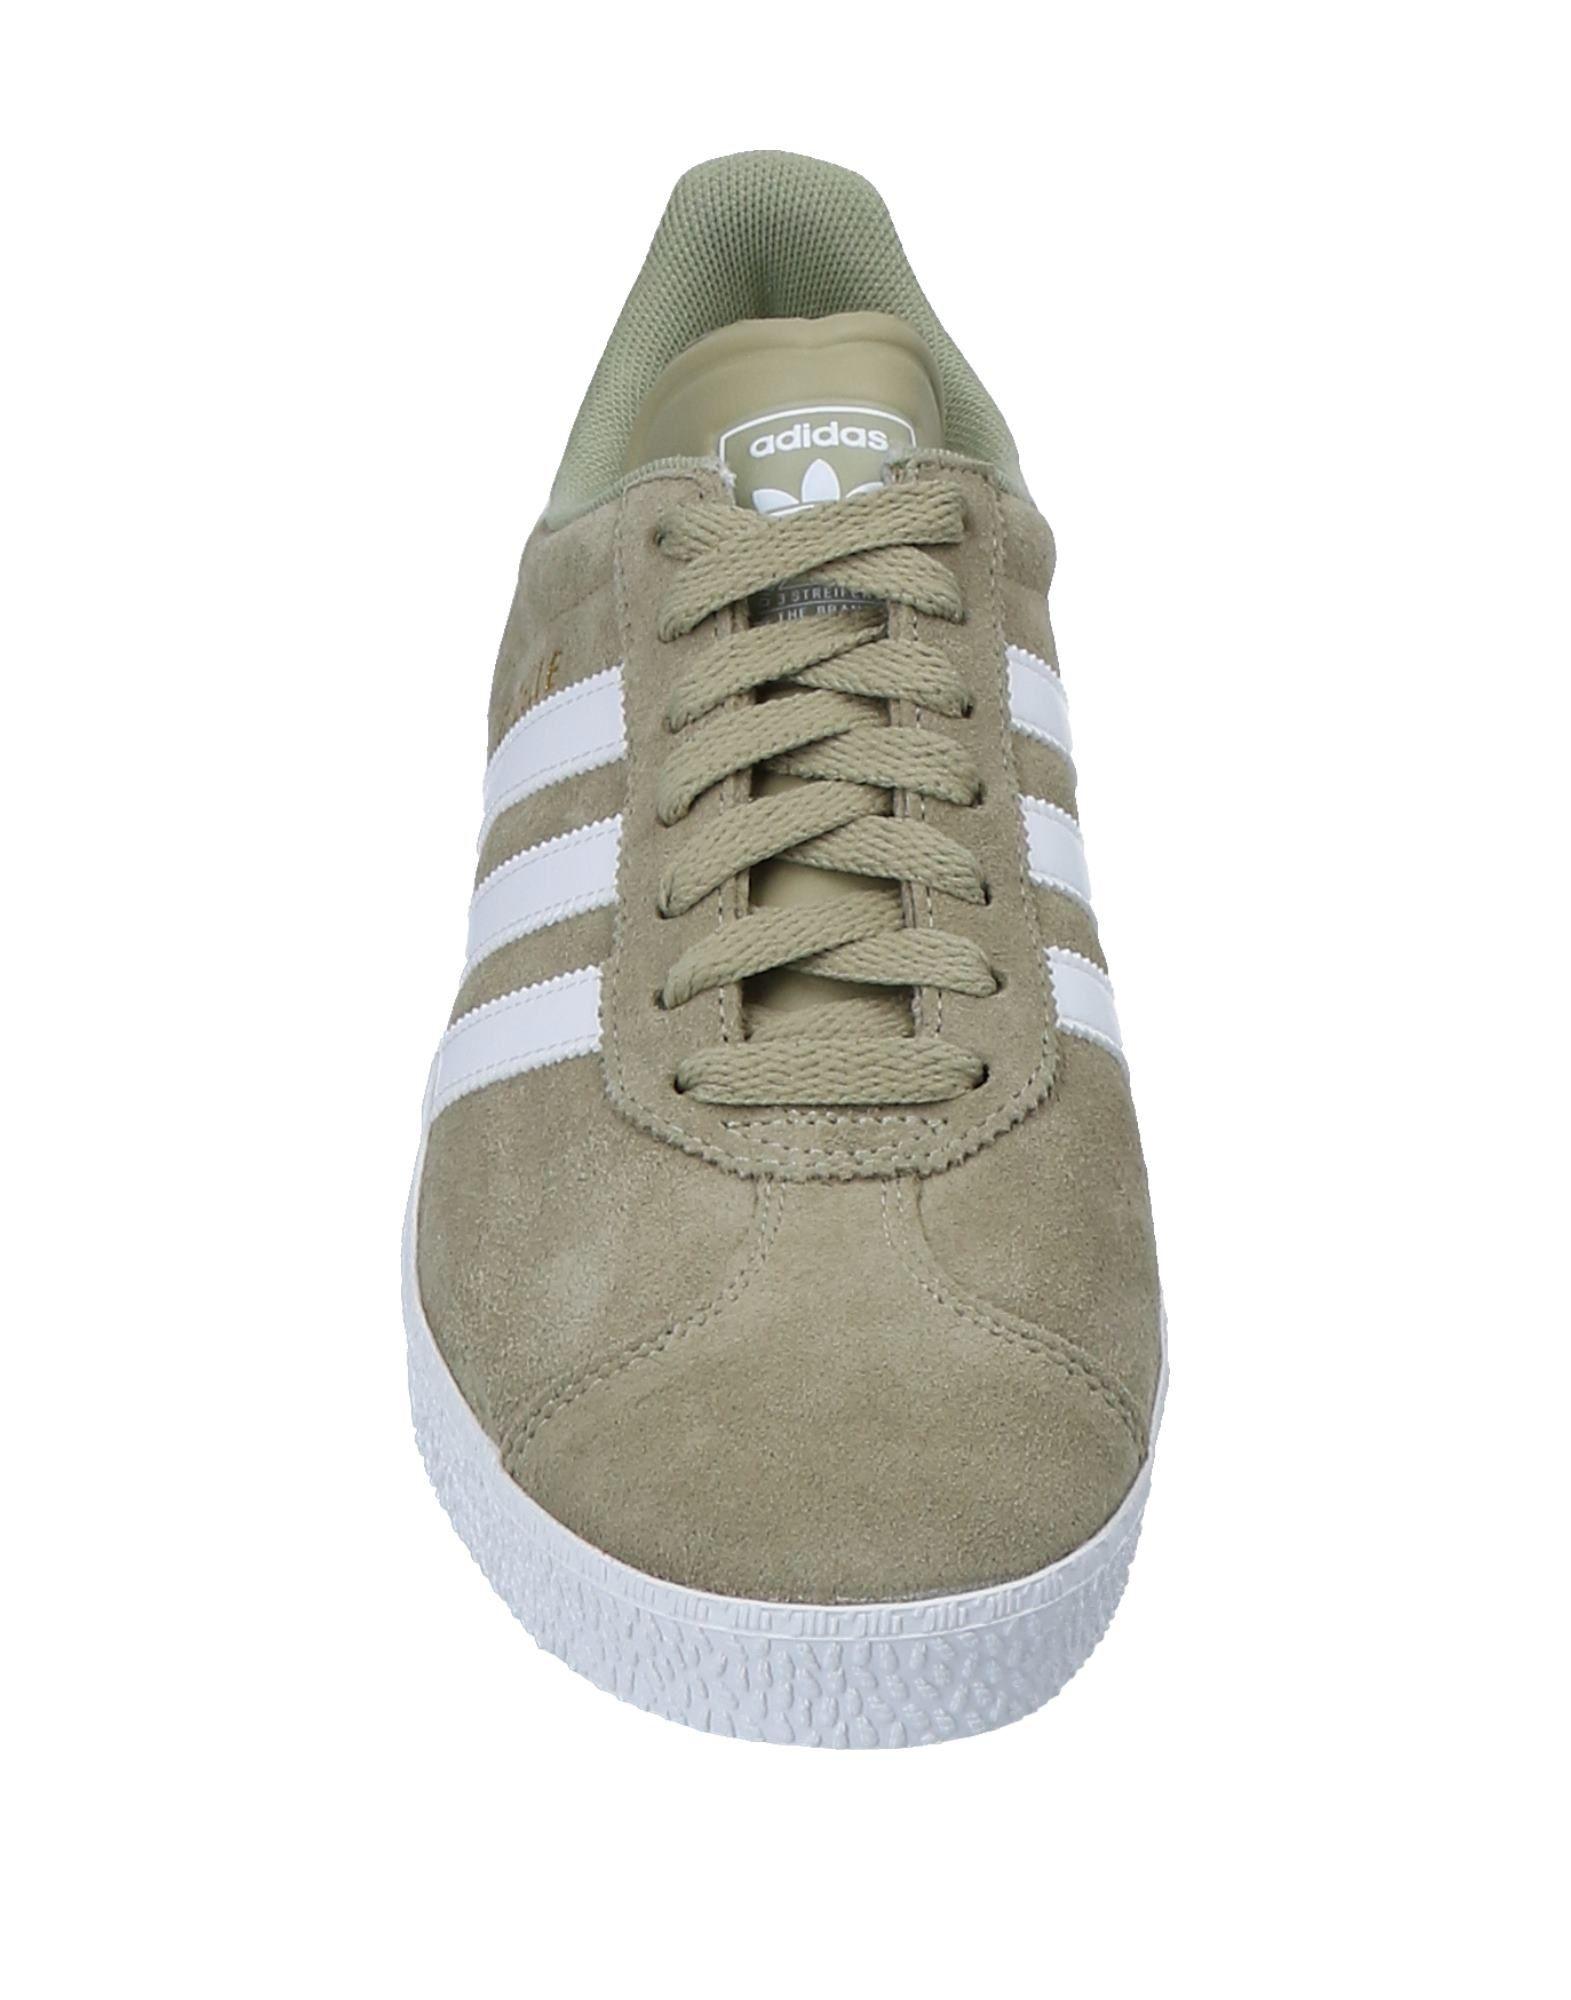 Rabatt echte Schuhe  Adidas Originals Sneakers Herren  Schuhe 11554656LL 4116e7